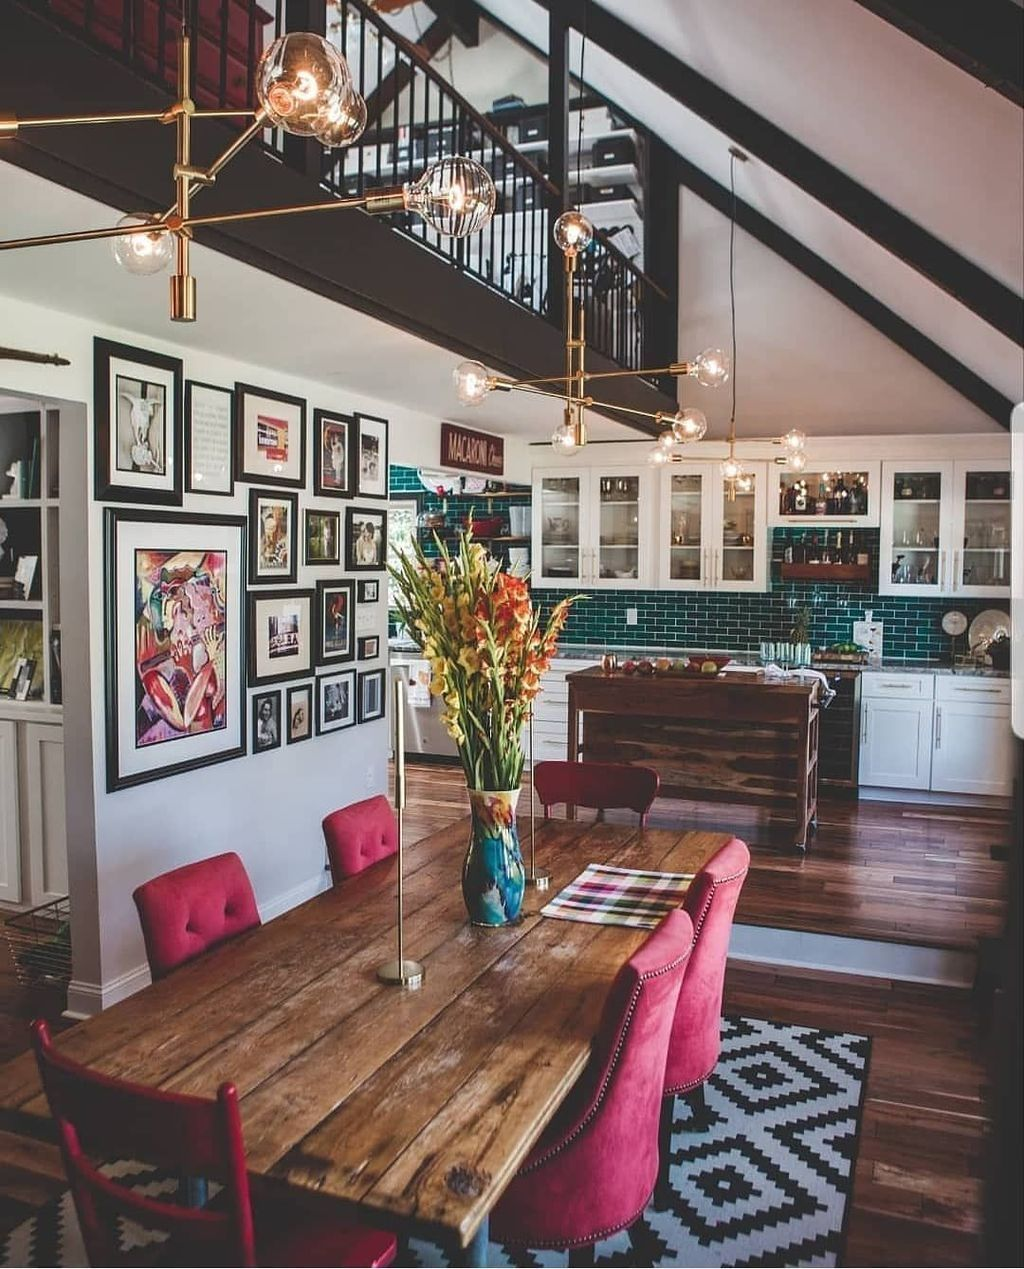 38 Classy Dining Rooms Design Ideas #diningrooms Cool 38 Classy Dining Rooms Design Ideas. #